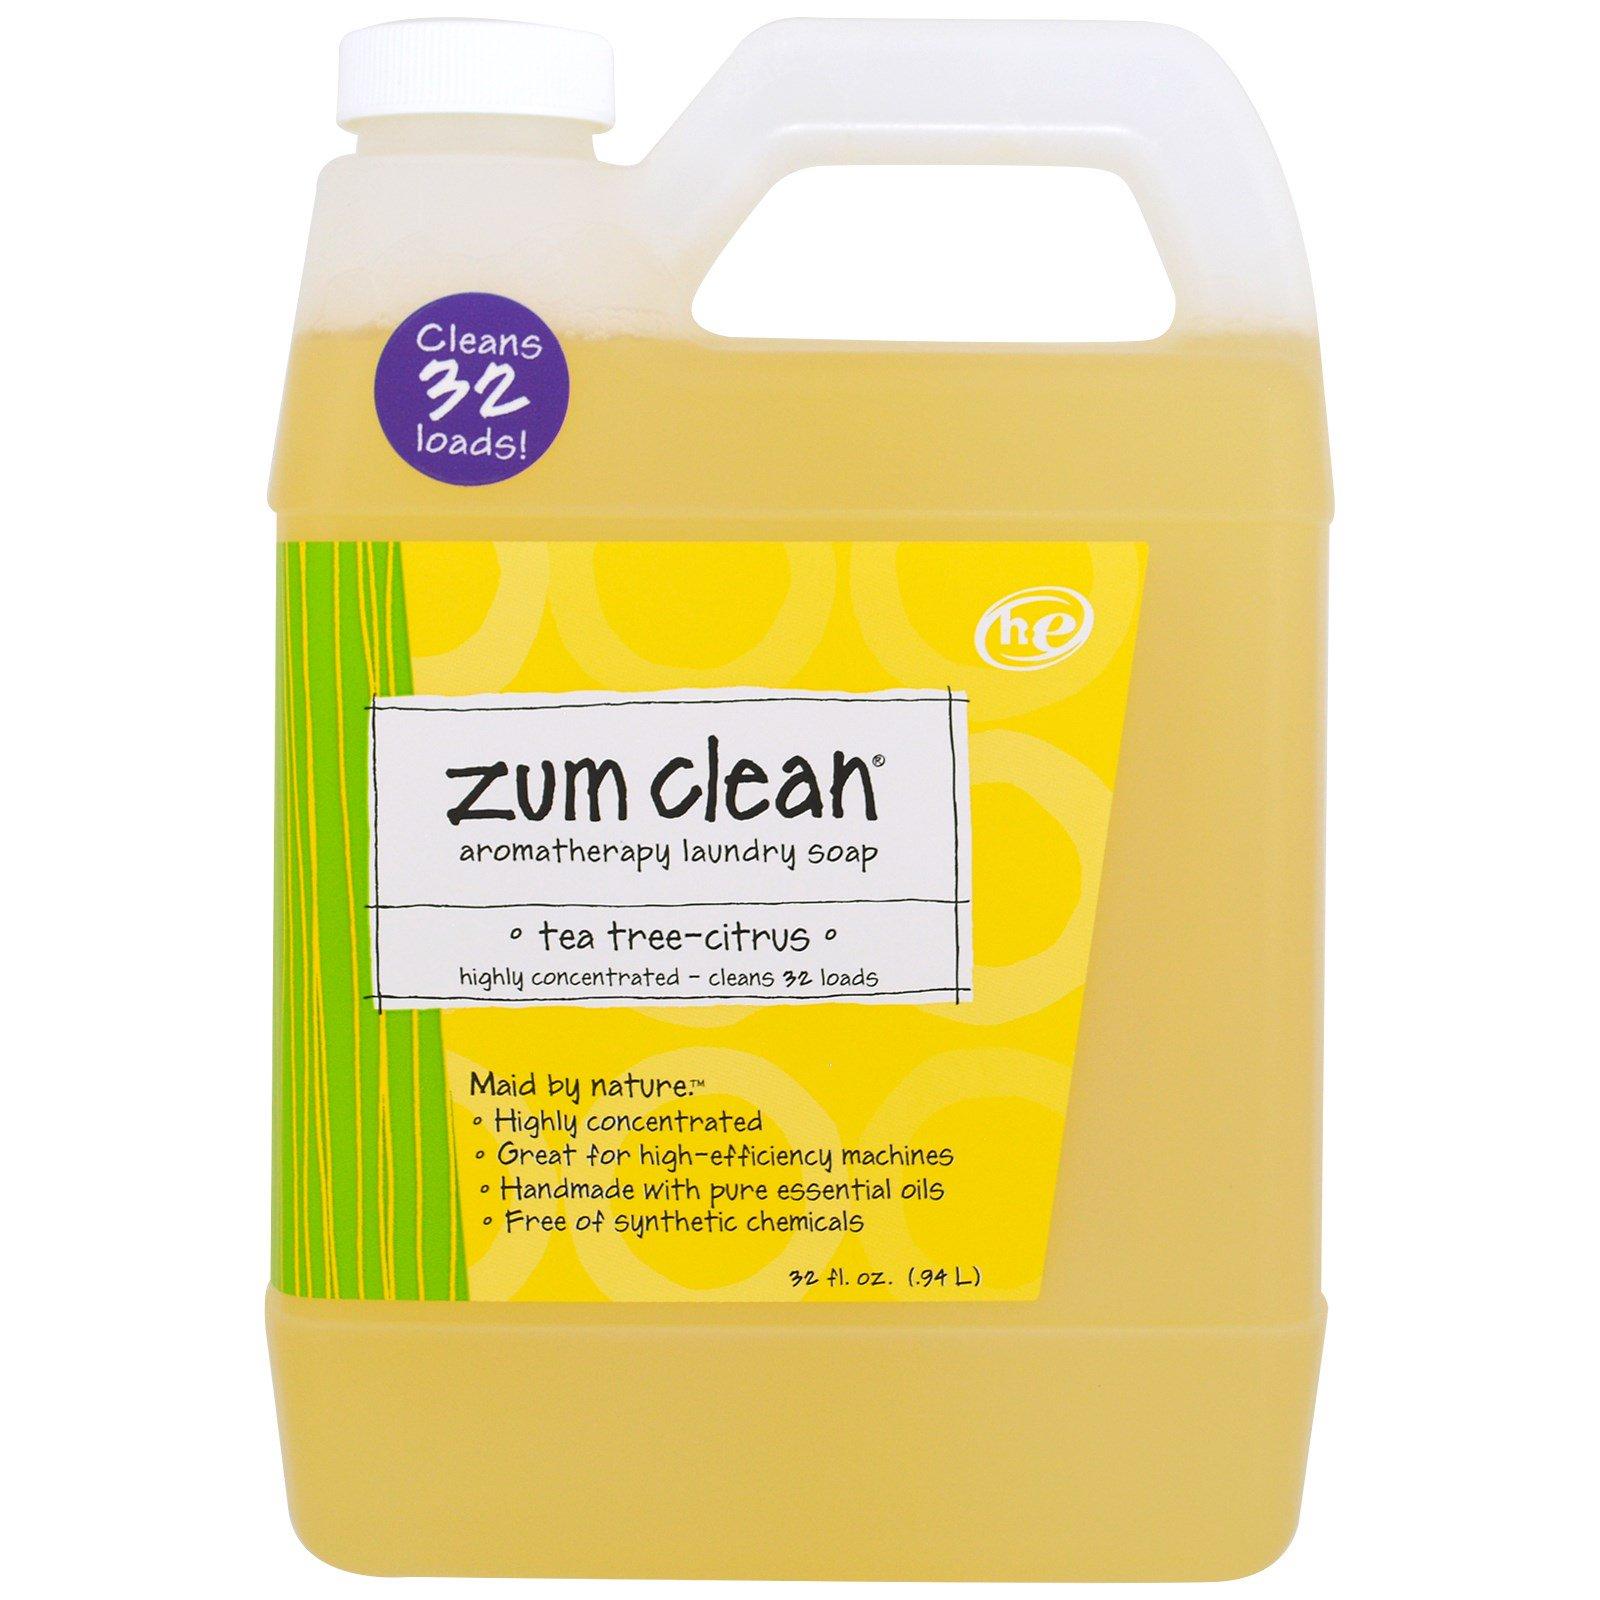 Indigo Wild Zum Clean Aromatherapy Laundry Soap Tea Tree